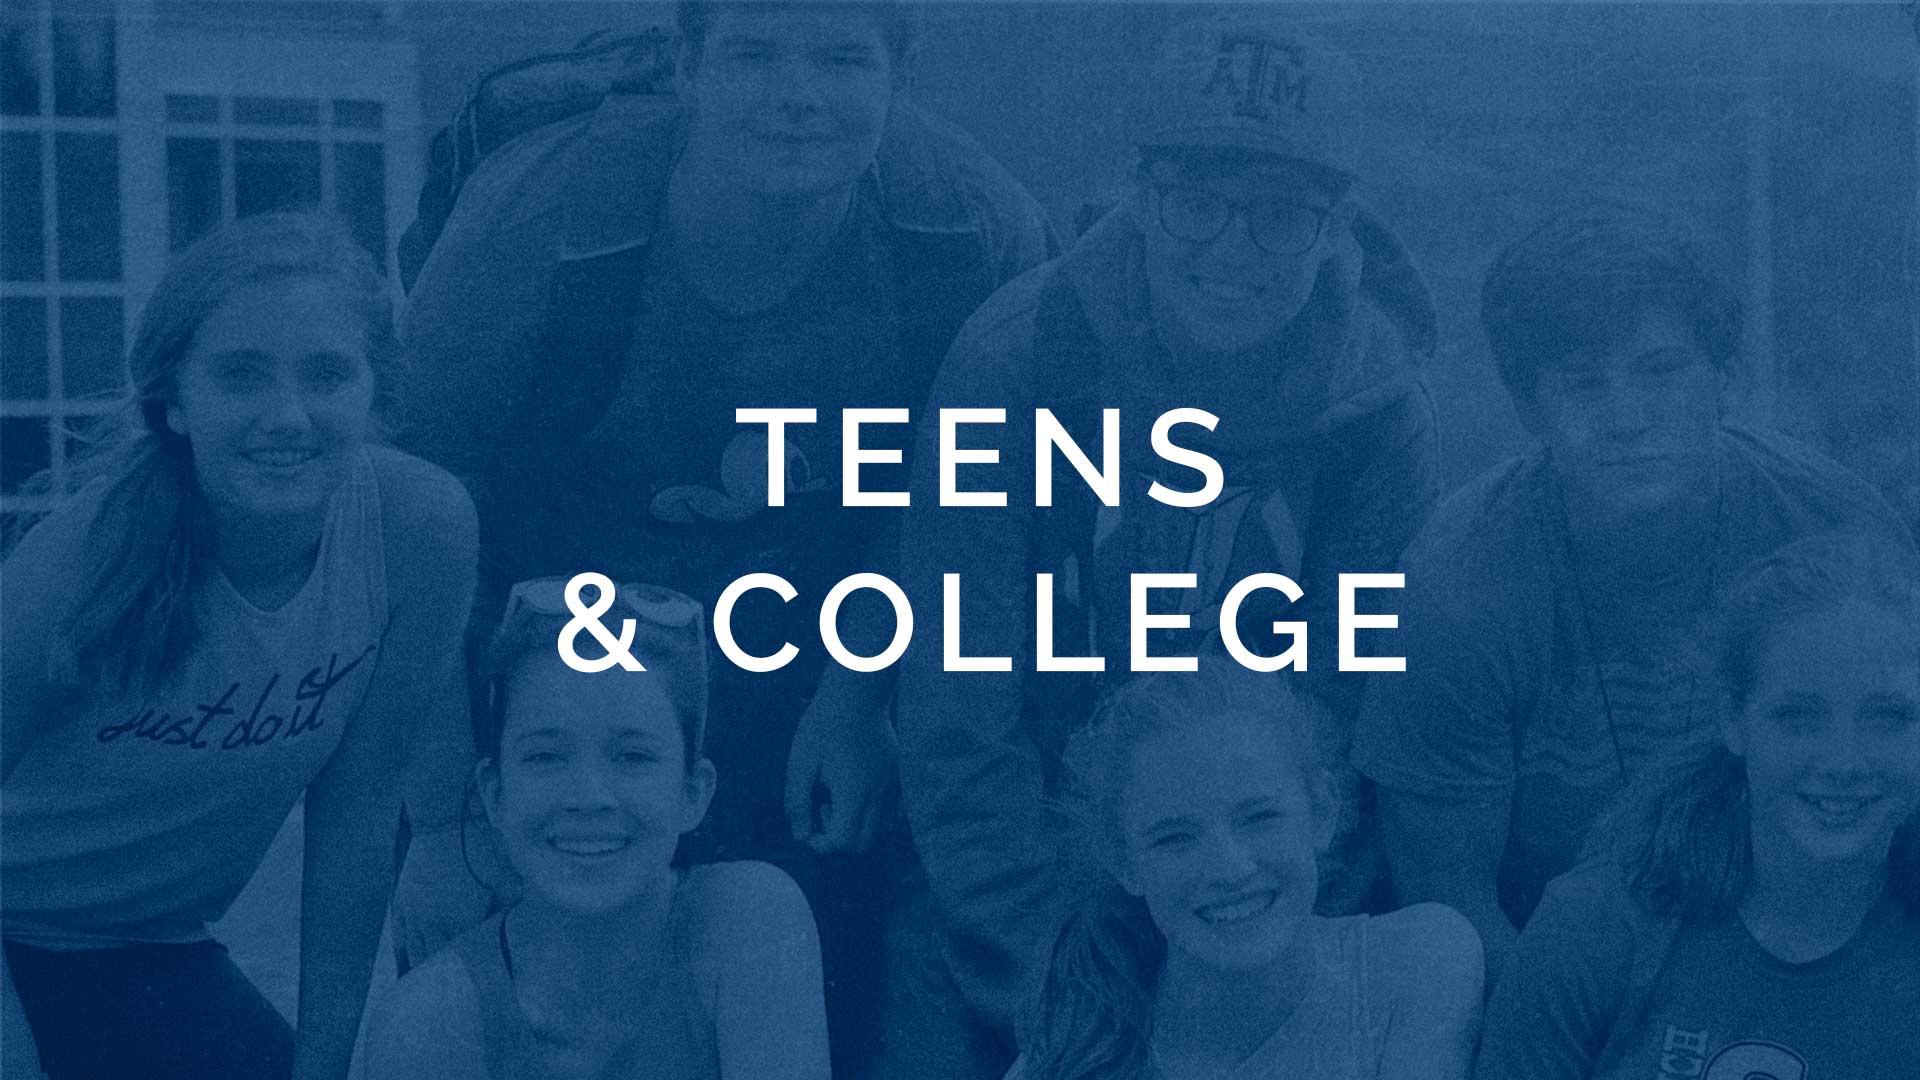 Teens & College